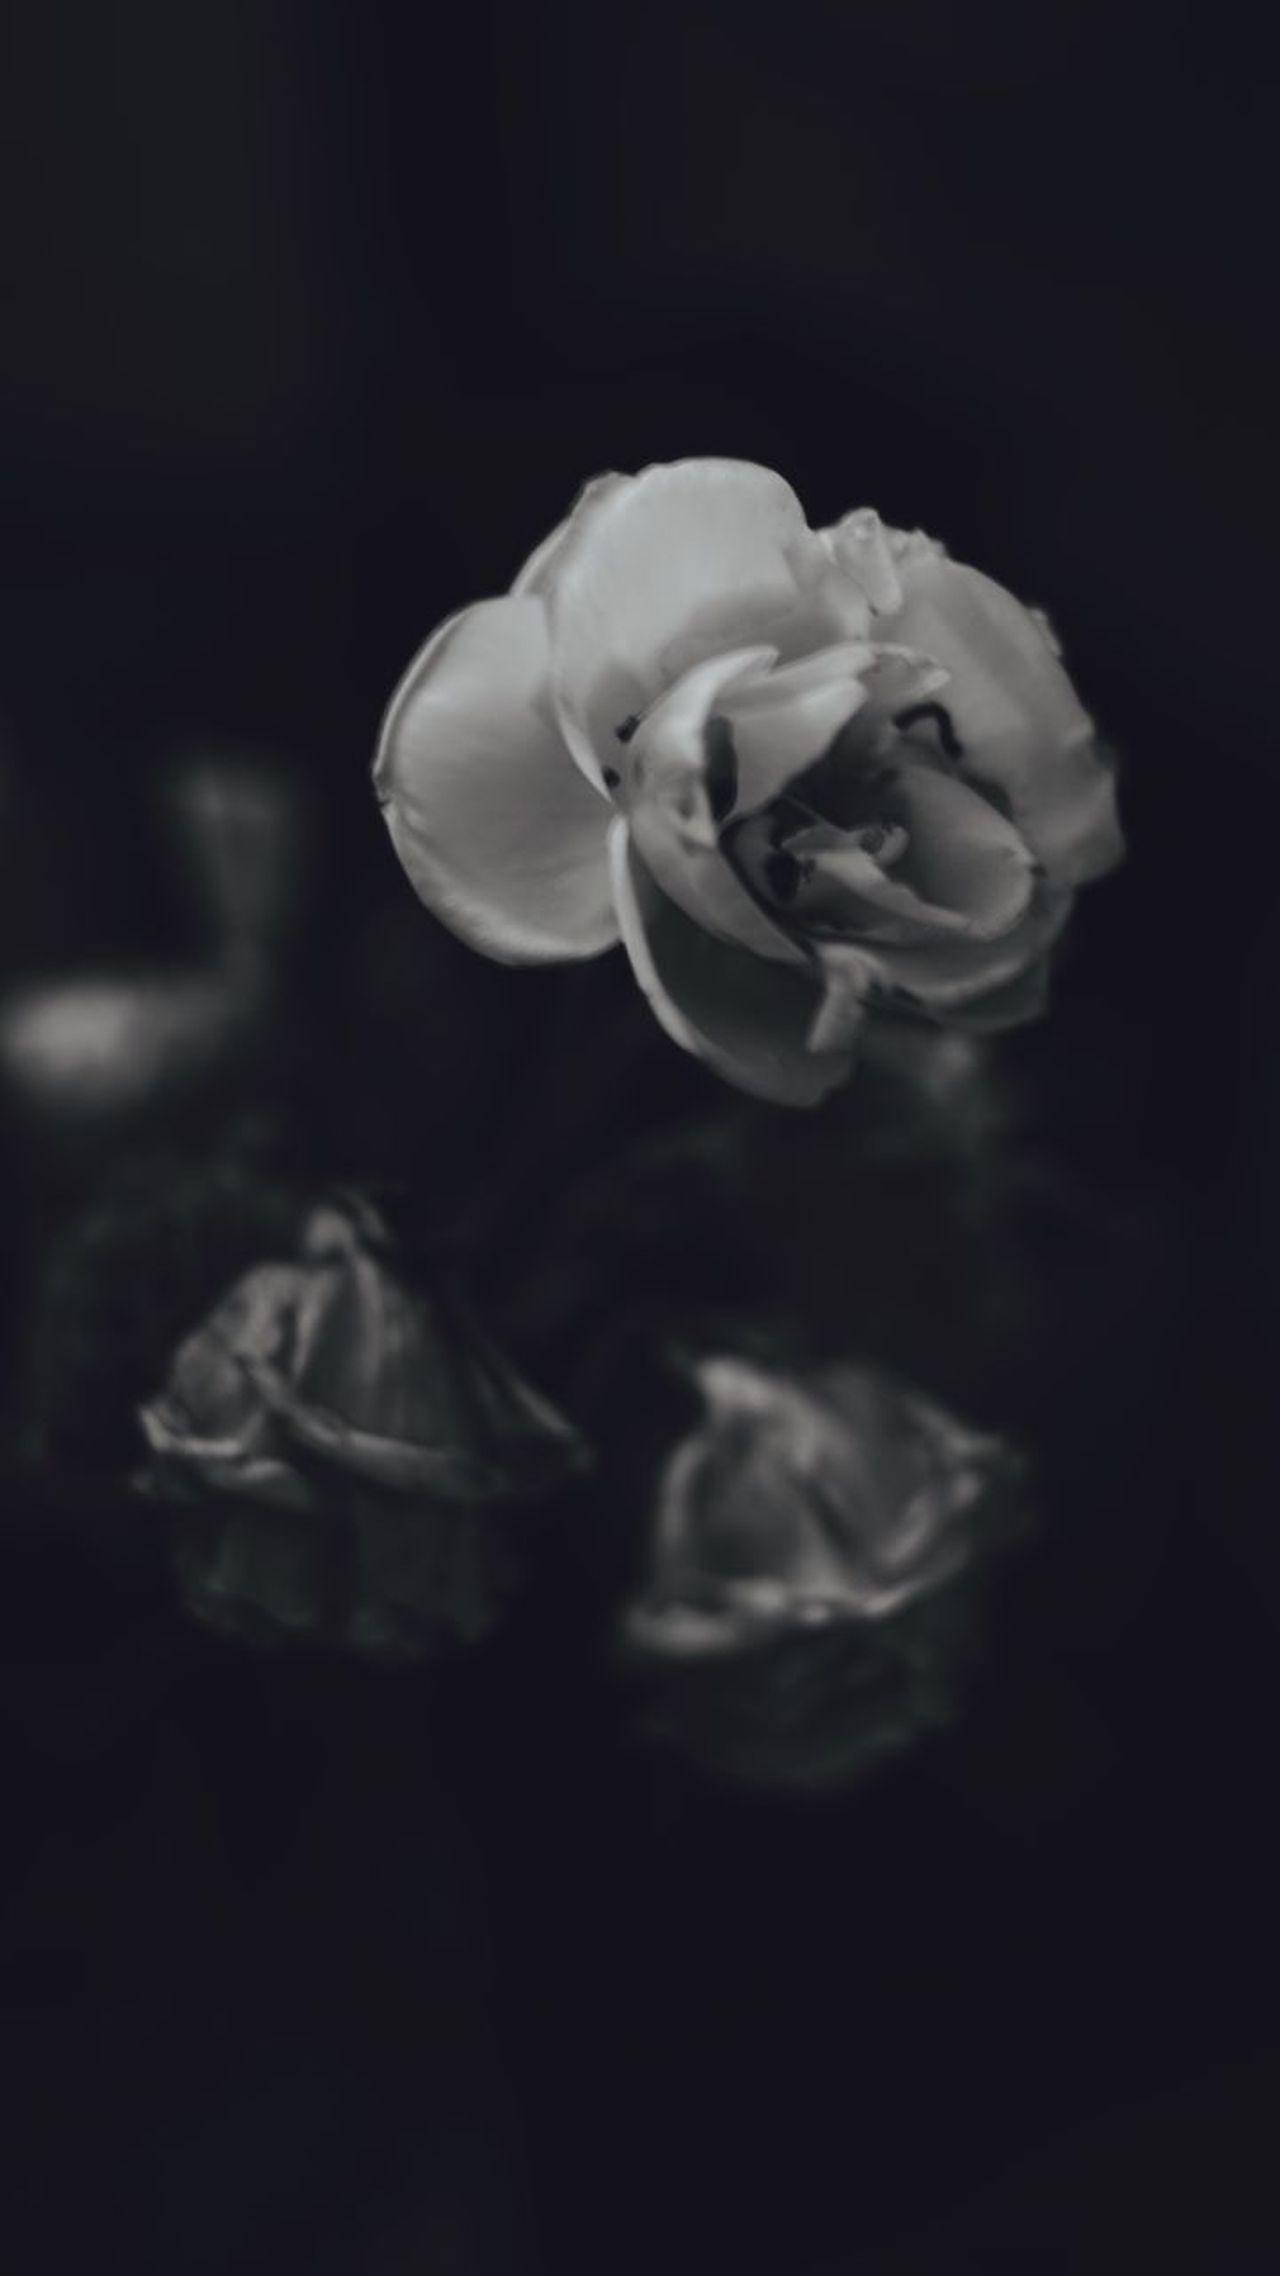 Flower Flower Head Beauty In Nature Rose - Flower Black Background Plant